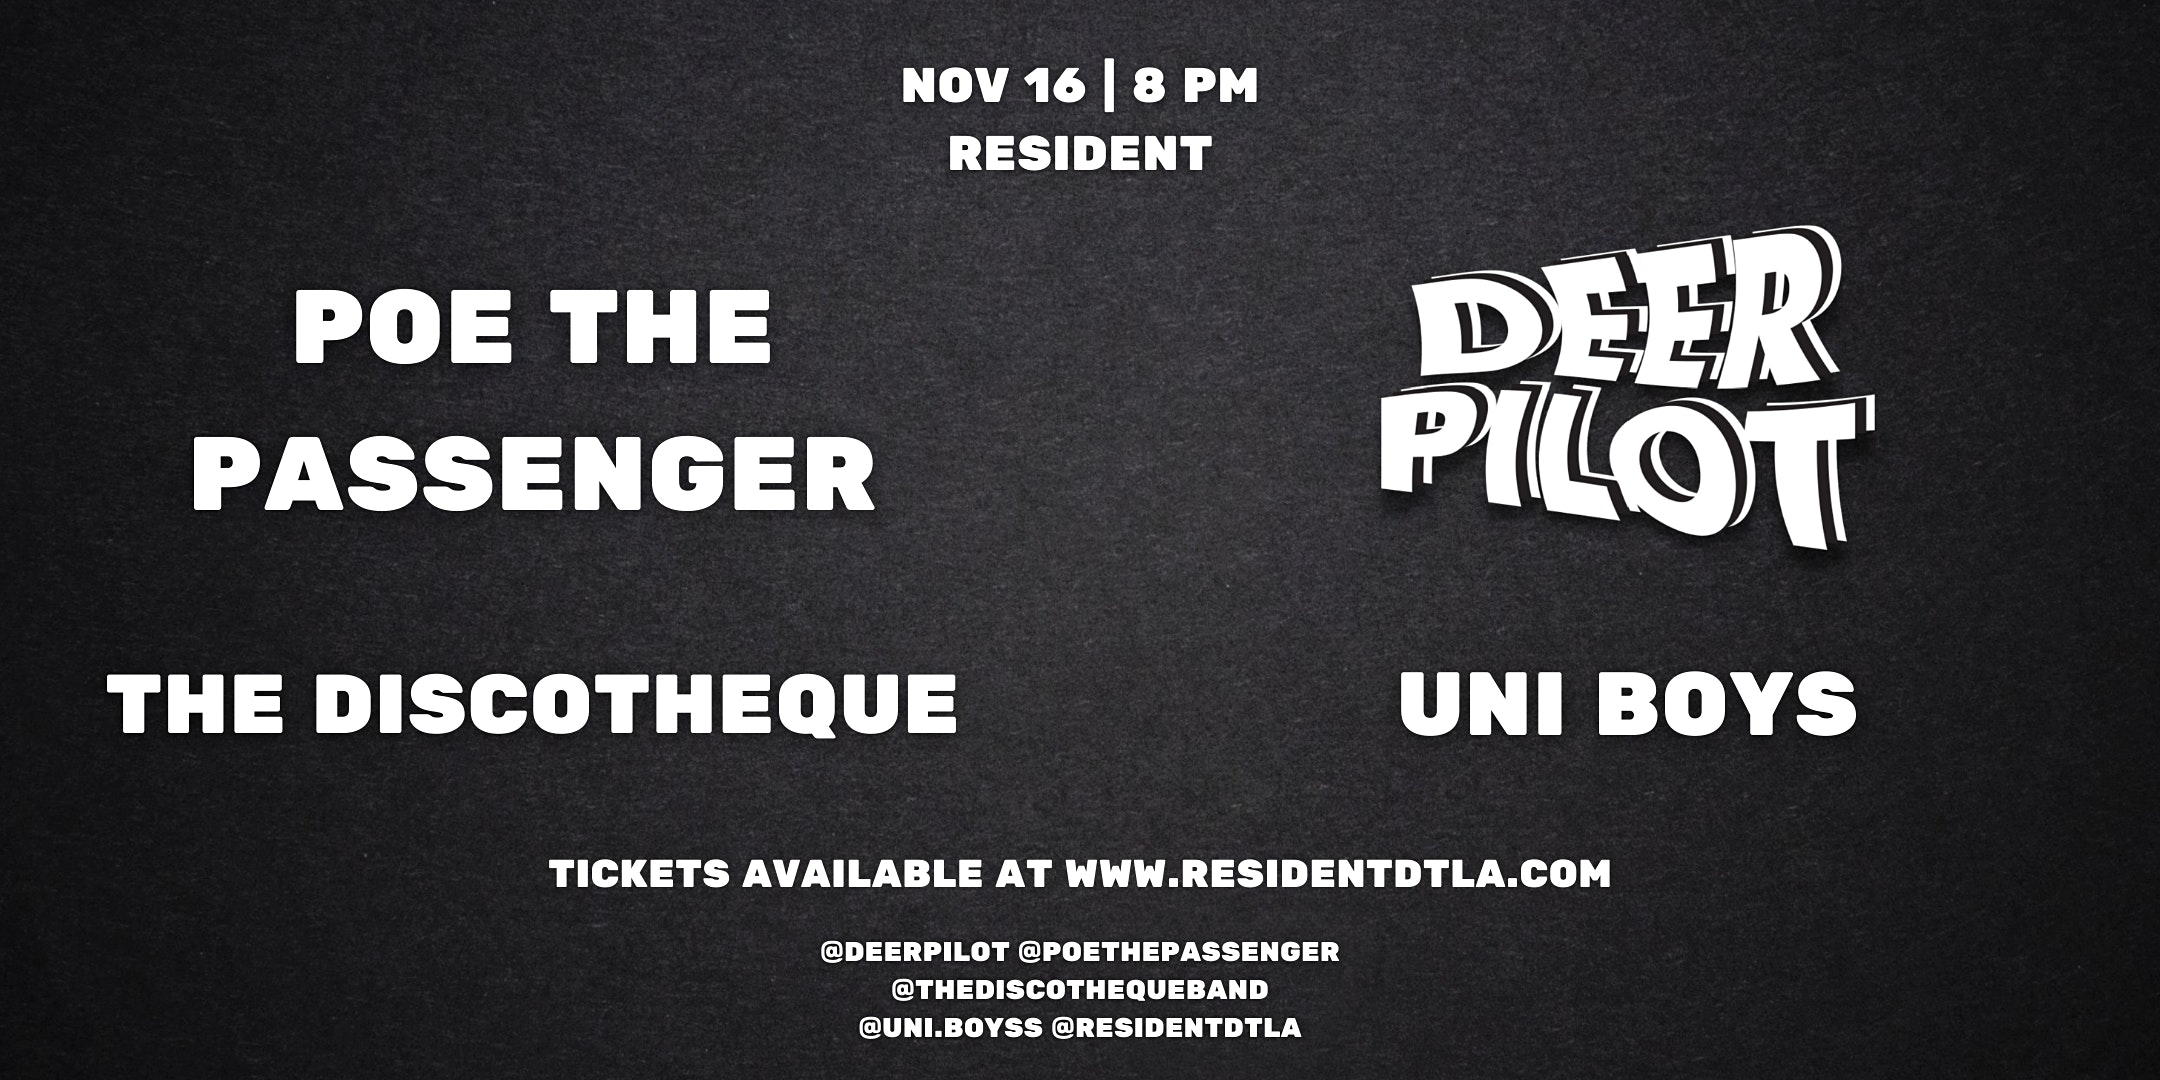 Deer Pilot - Uni Boys - Poe the Passenger - The Discotheque